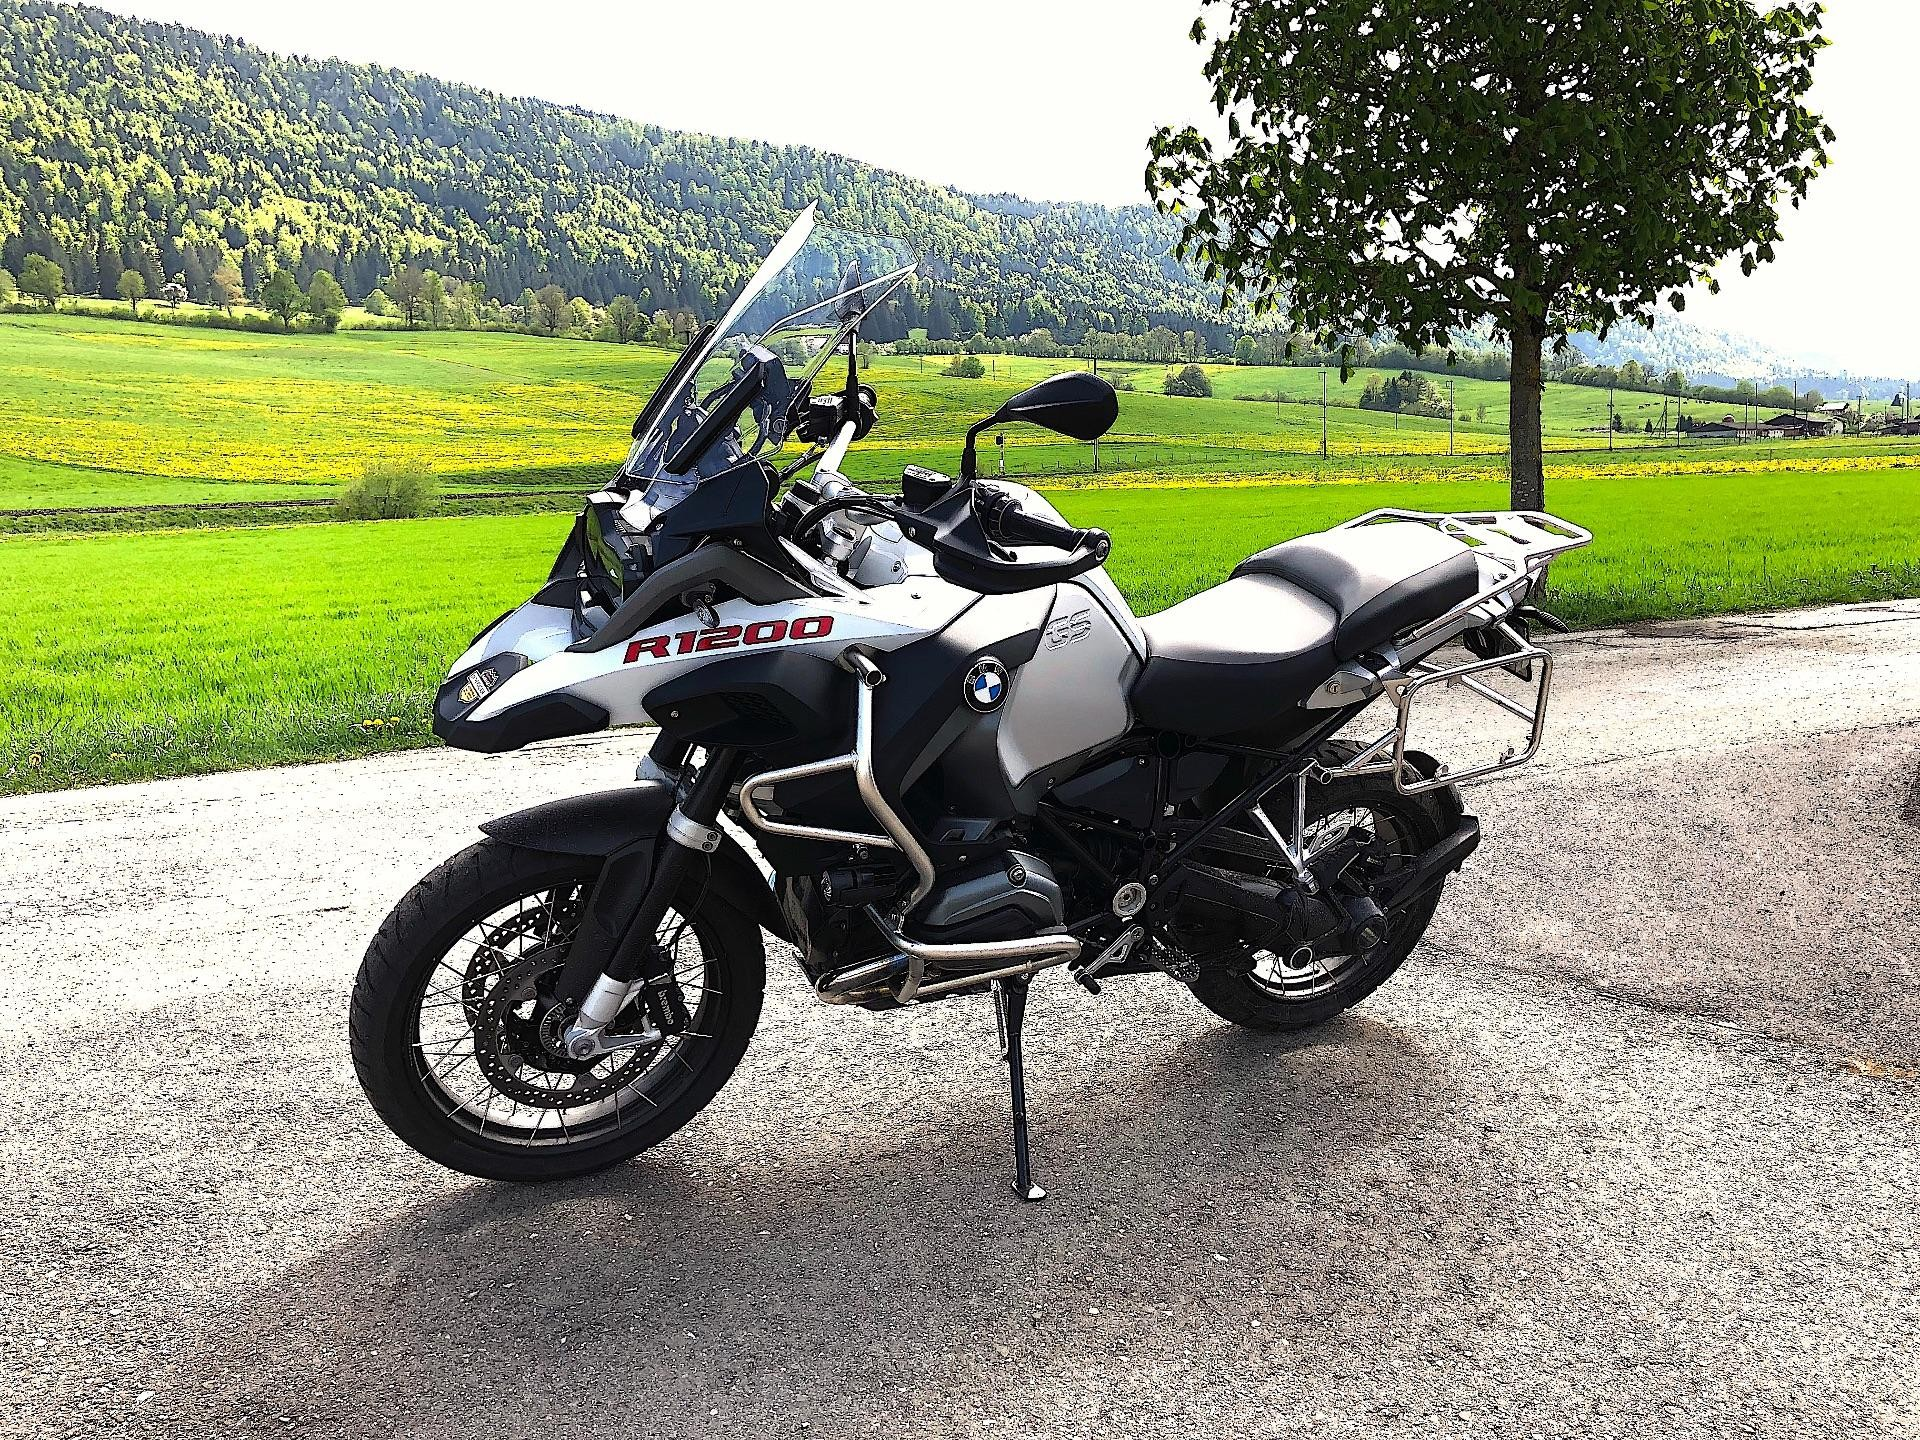 Motorrad Mieten Bmw R 1200 Gs Adventure Abs Garage On The Road Again